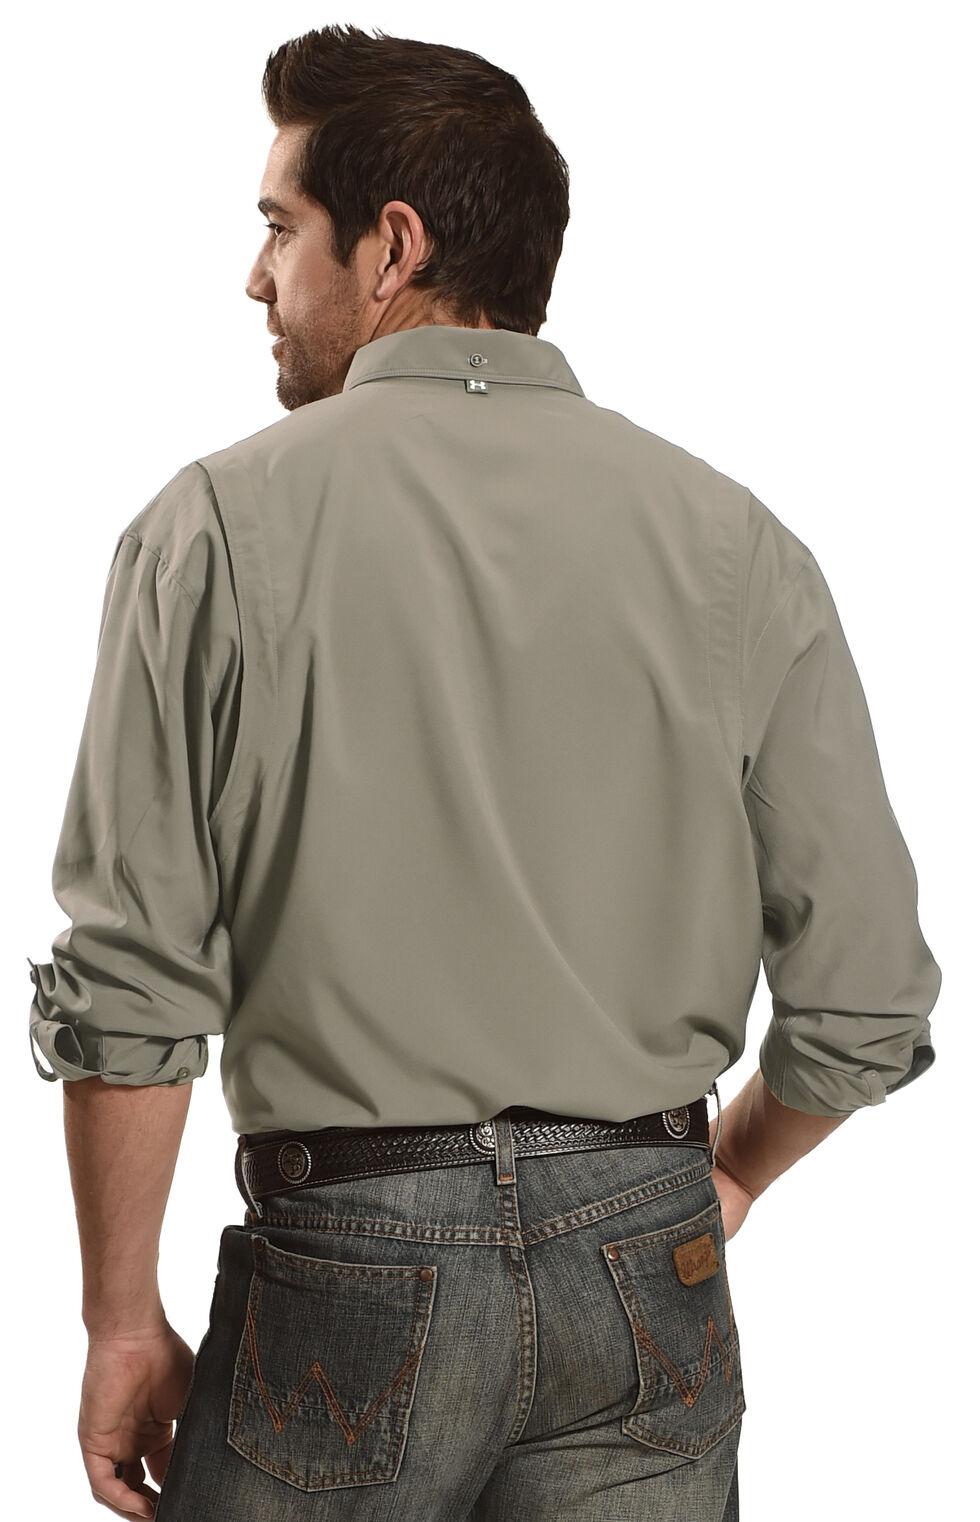 Under Armour Men's Tide Chaser Long Sleeve Shirt, Lt Green, hi-res